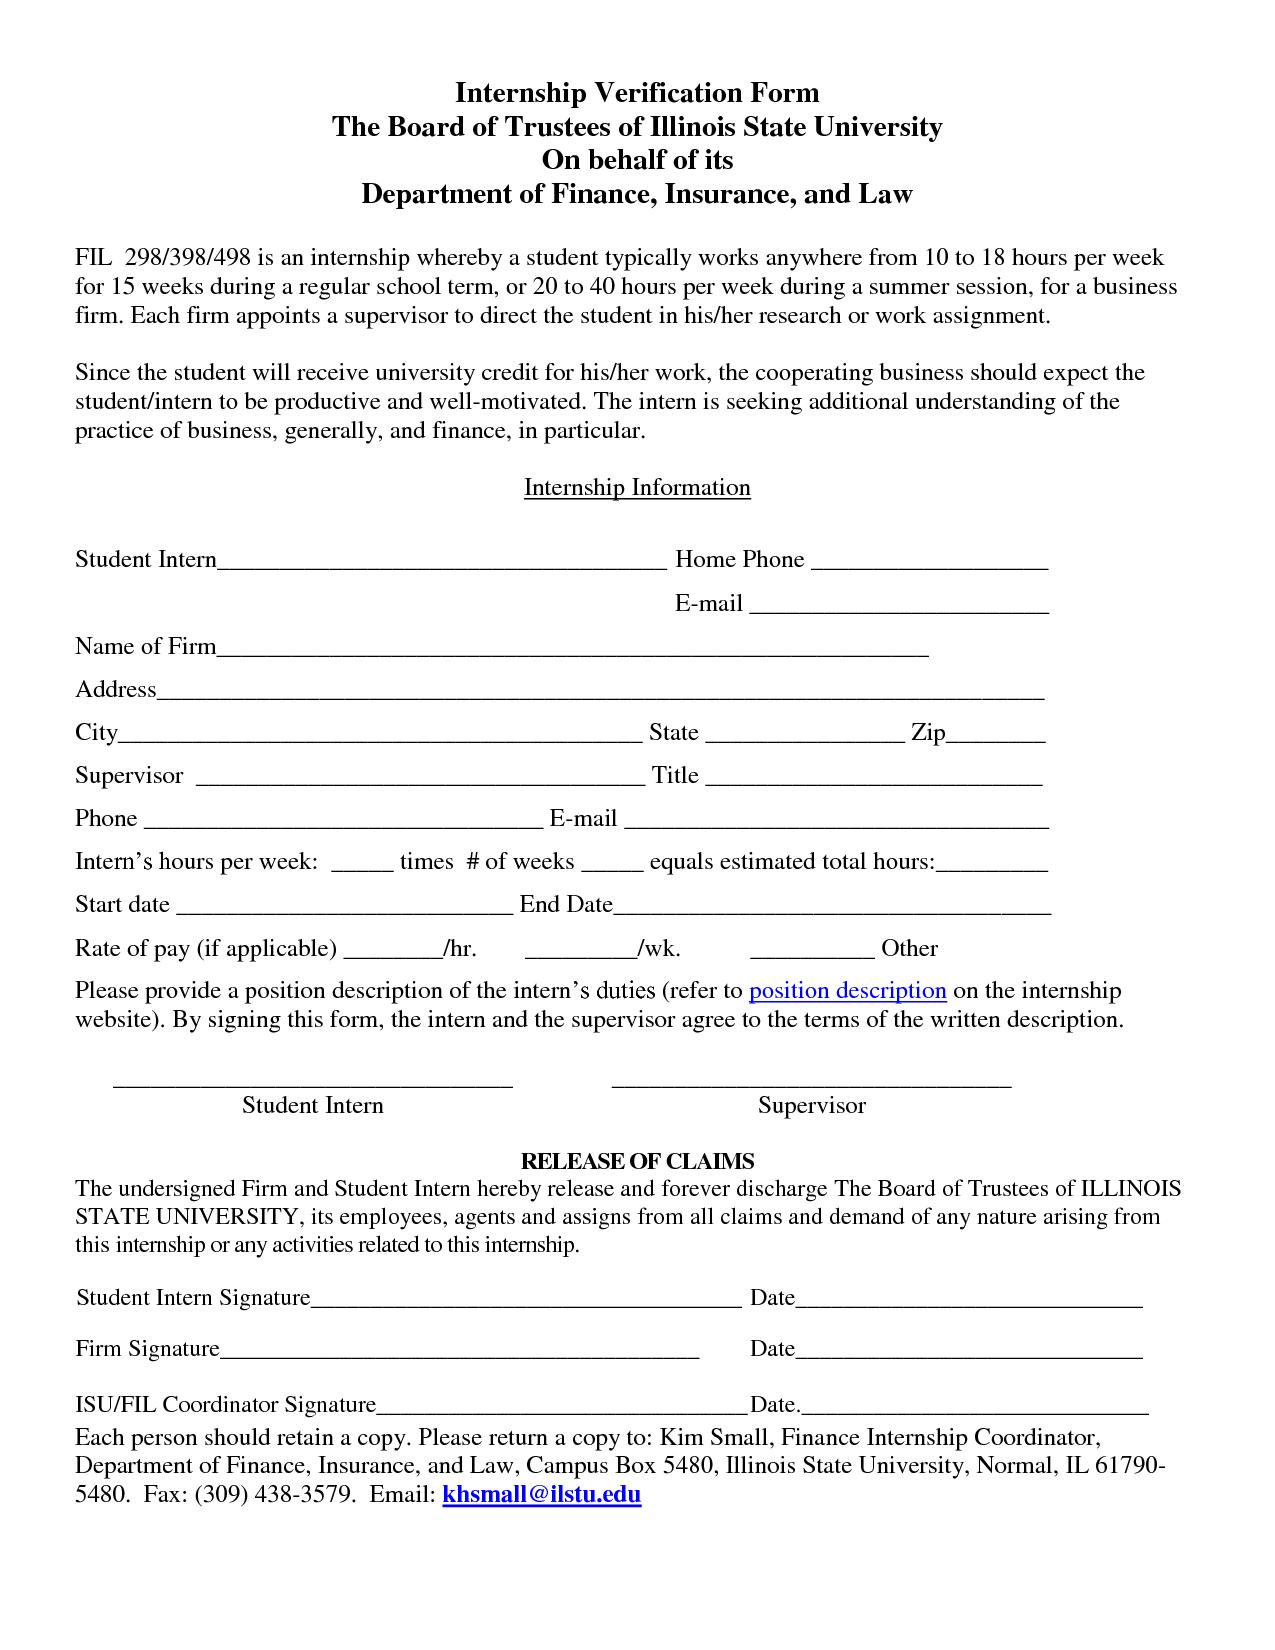 16 Awesome free printable employment verification form – Printable Employment Verification Form